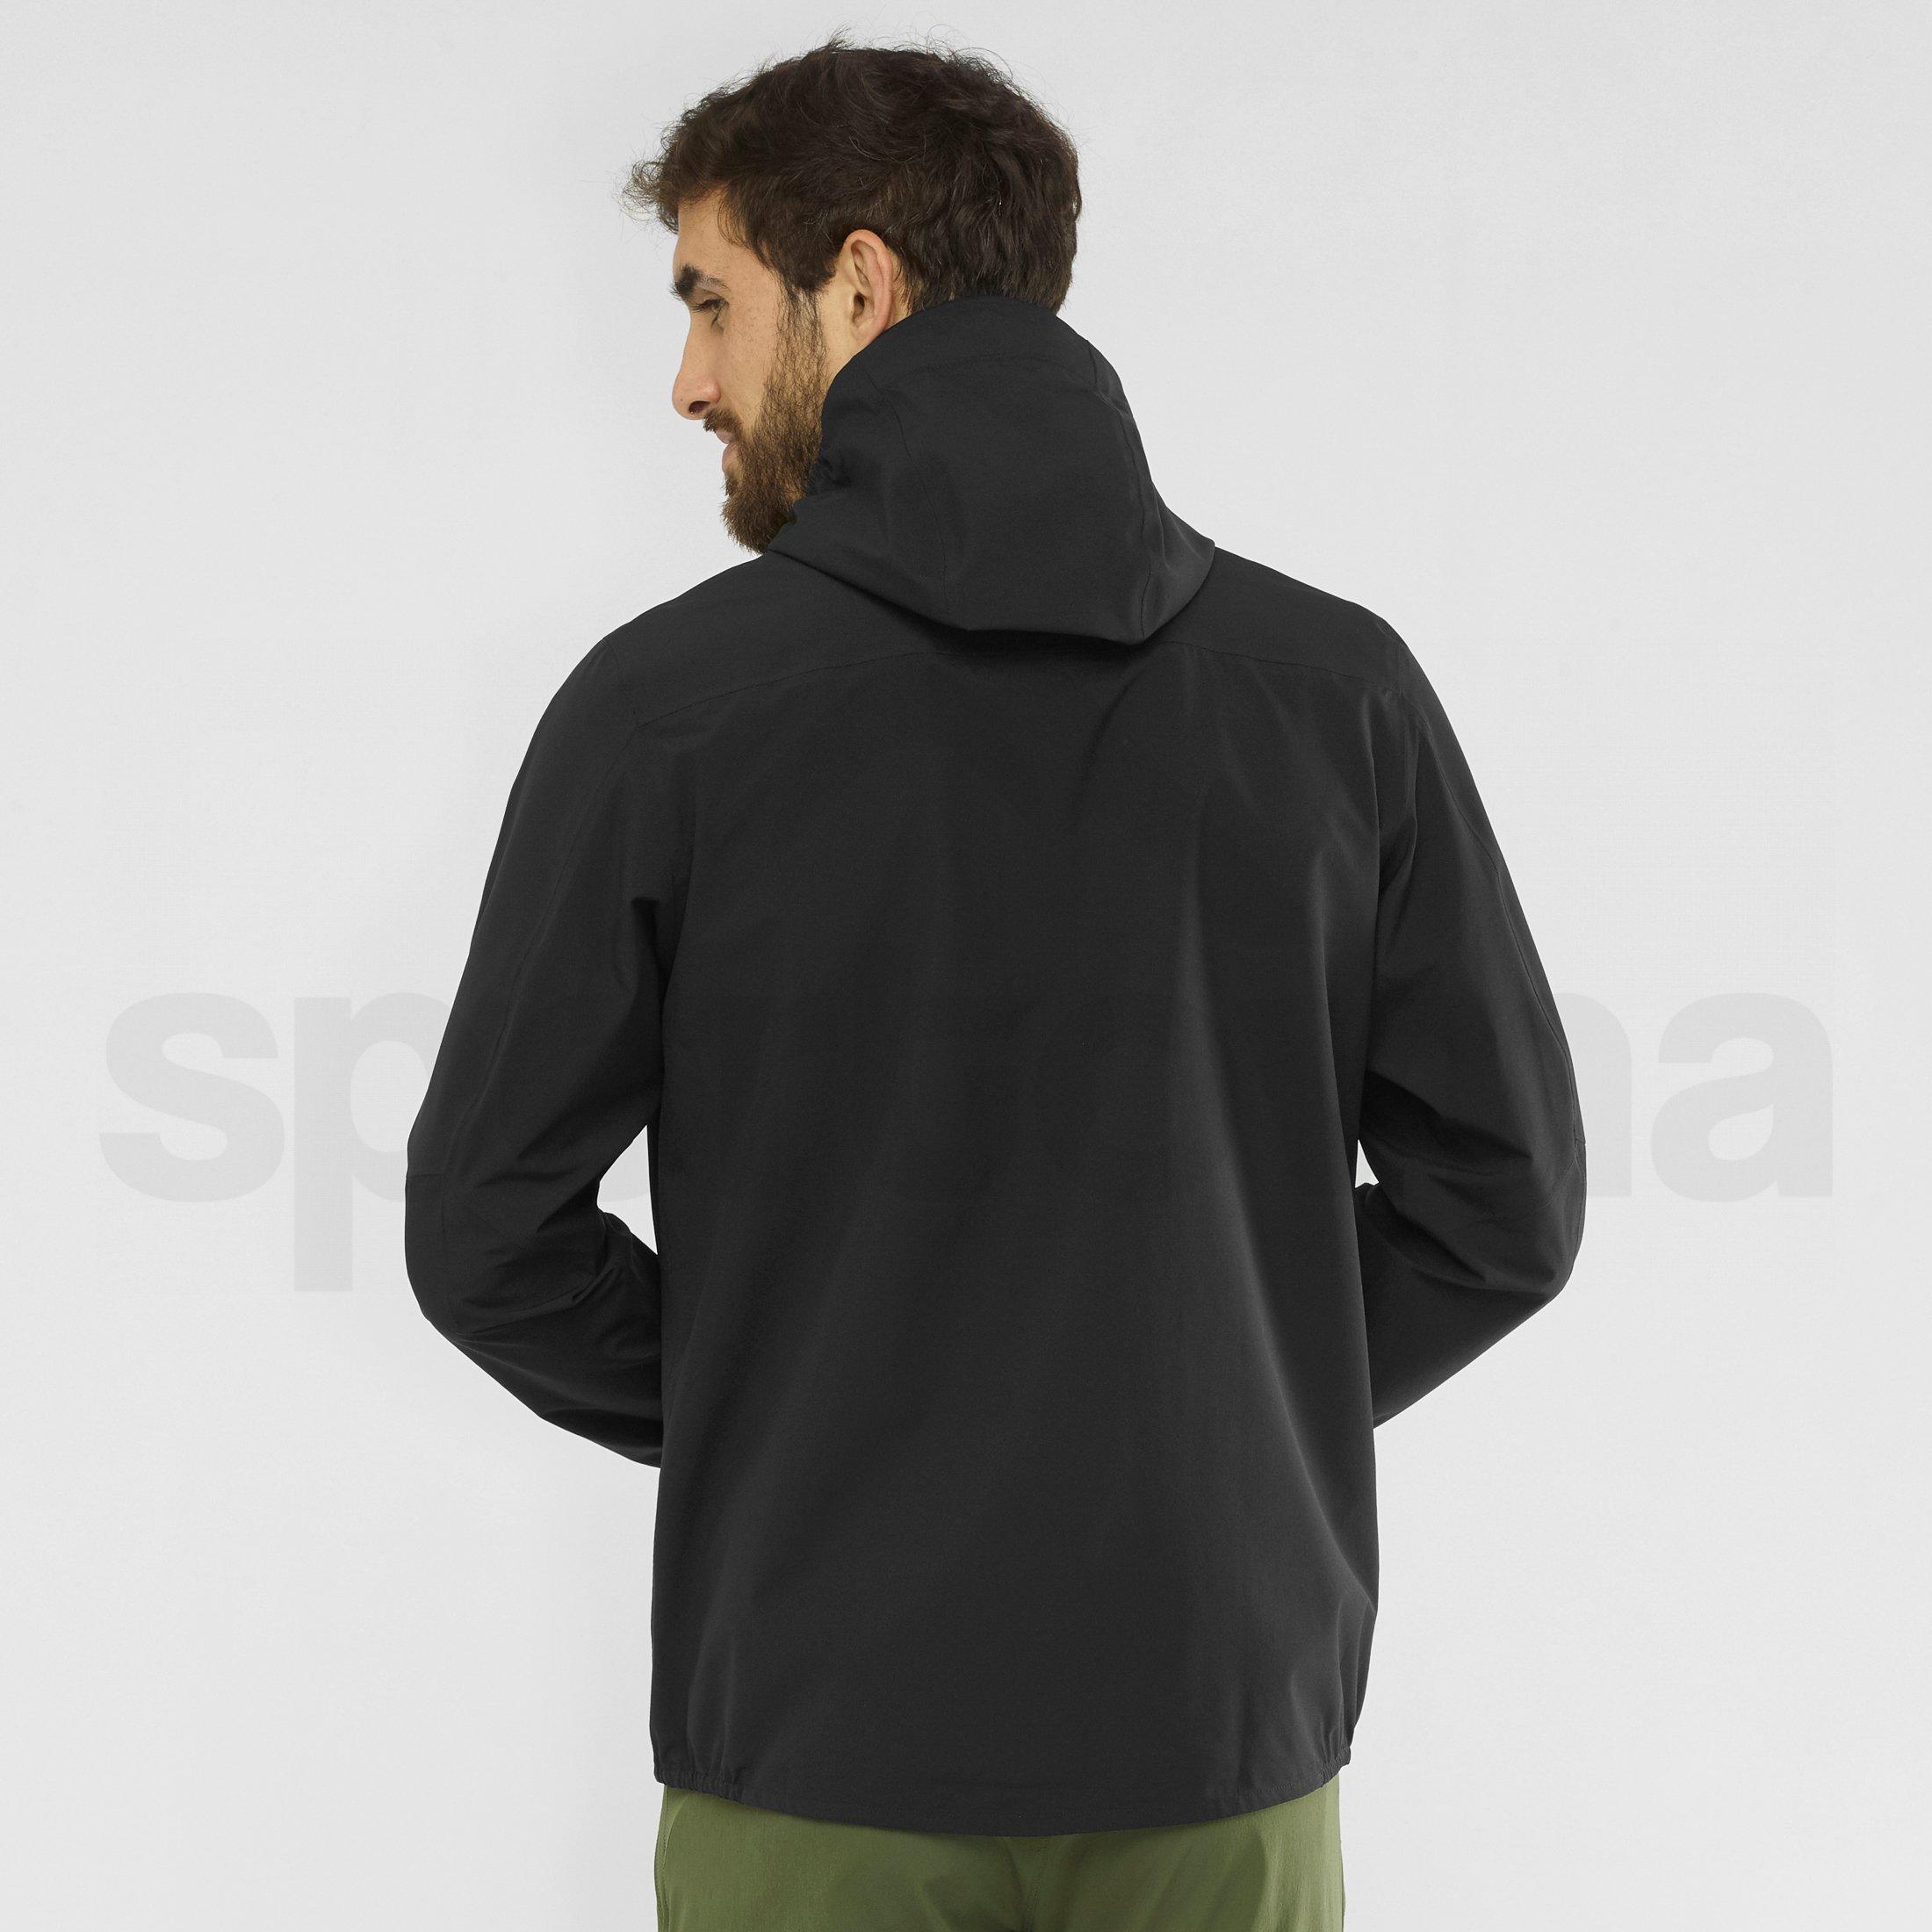 Bunda Salomon Outline JKT M - černá